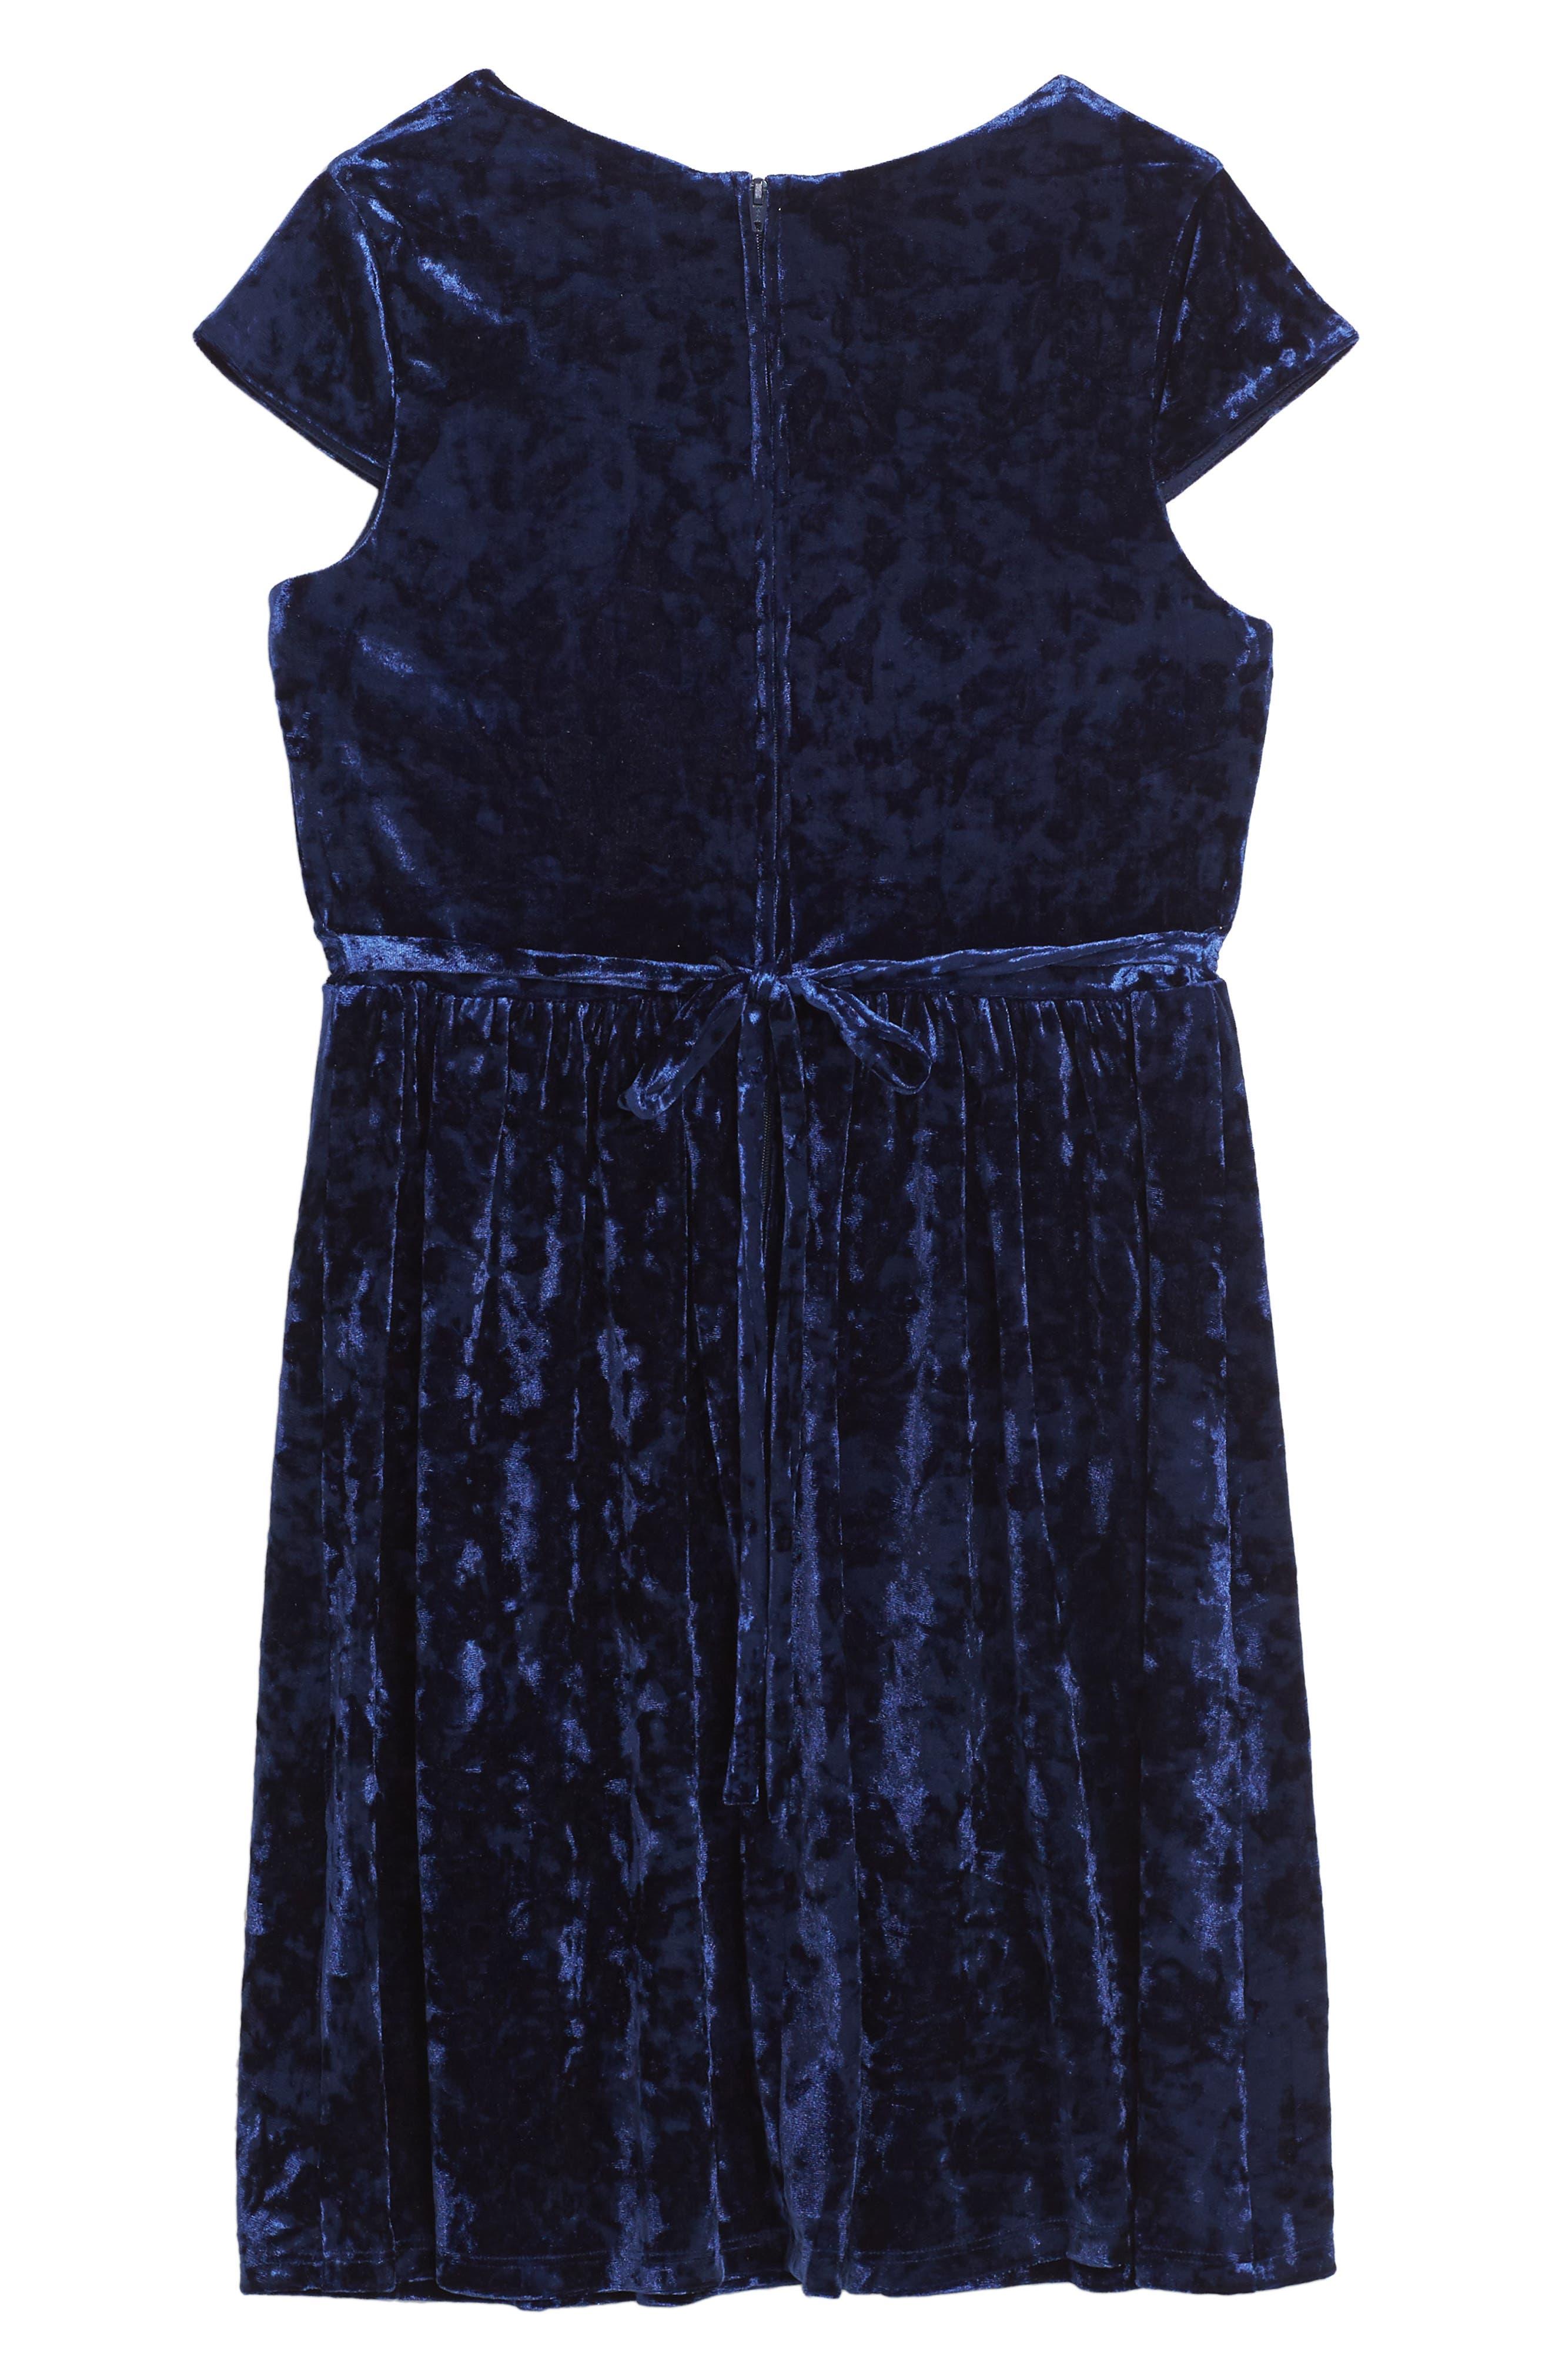 Alternate Image 2  - BLUSH by Us Angels Velvet Dress (Big Girls)